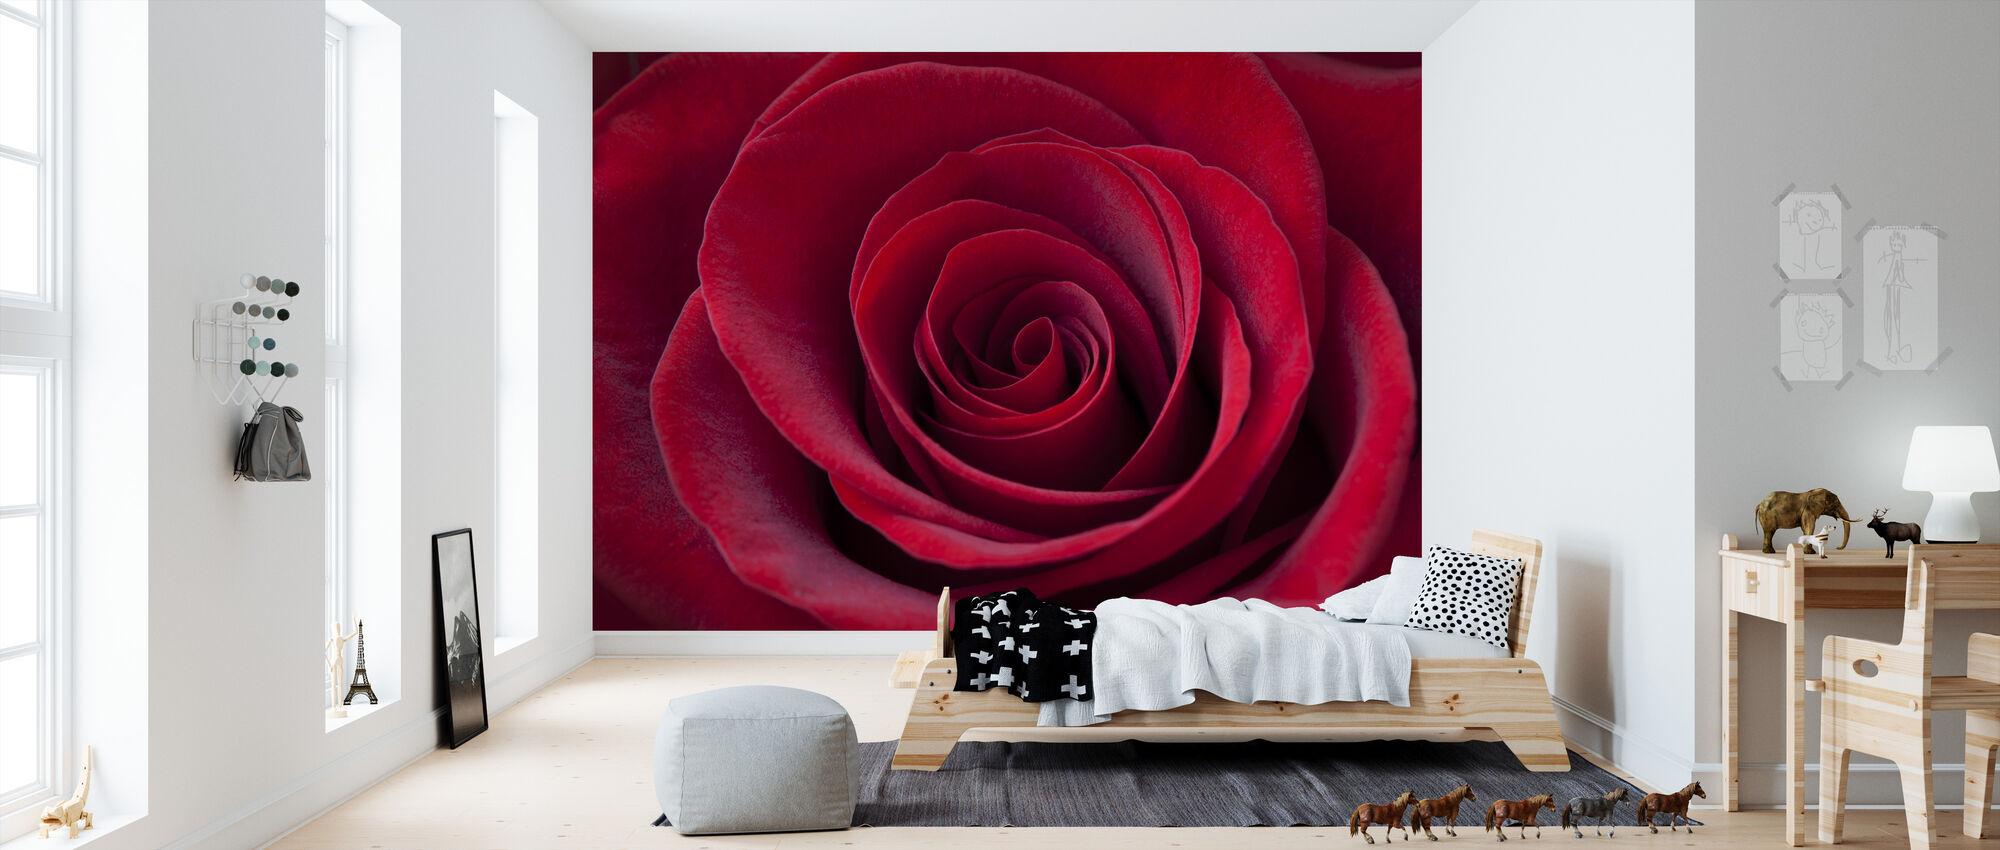 Deep Red Rose - Wallpaper - Kids Room